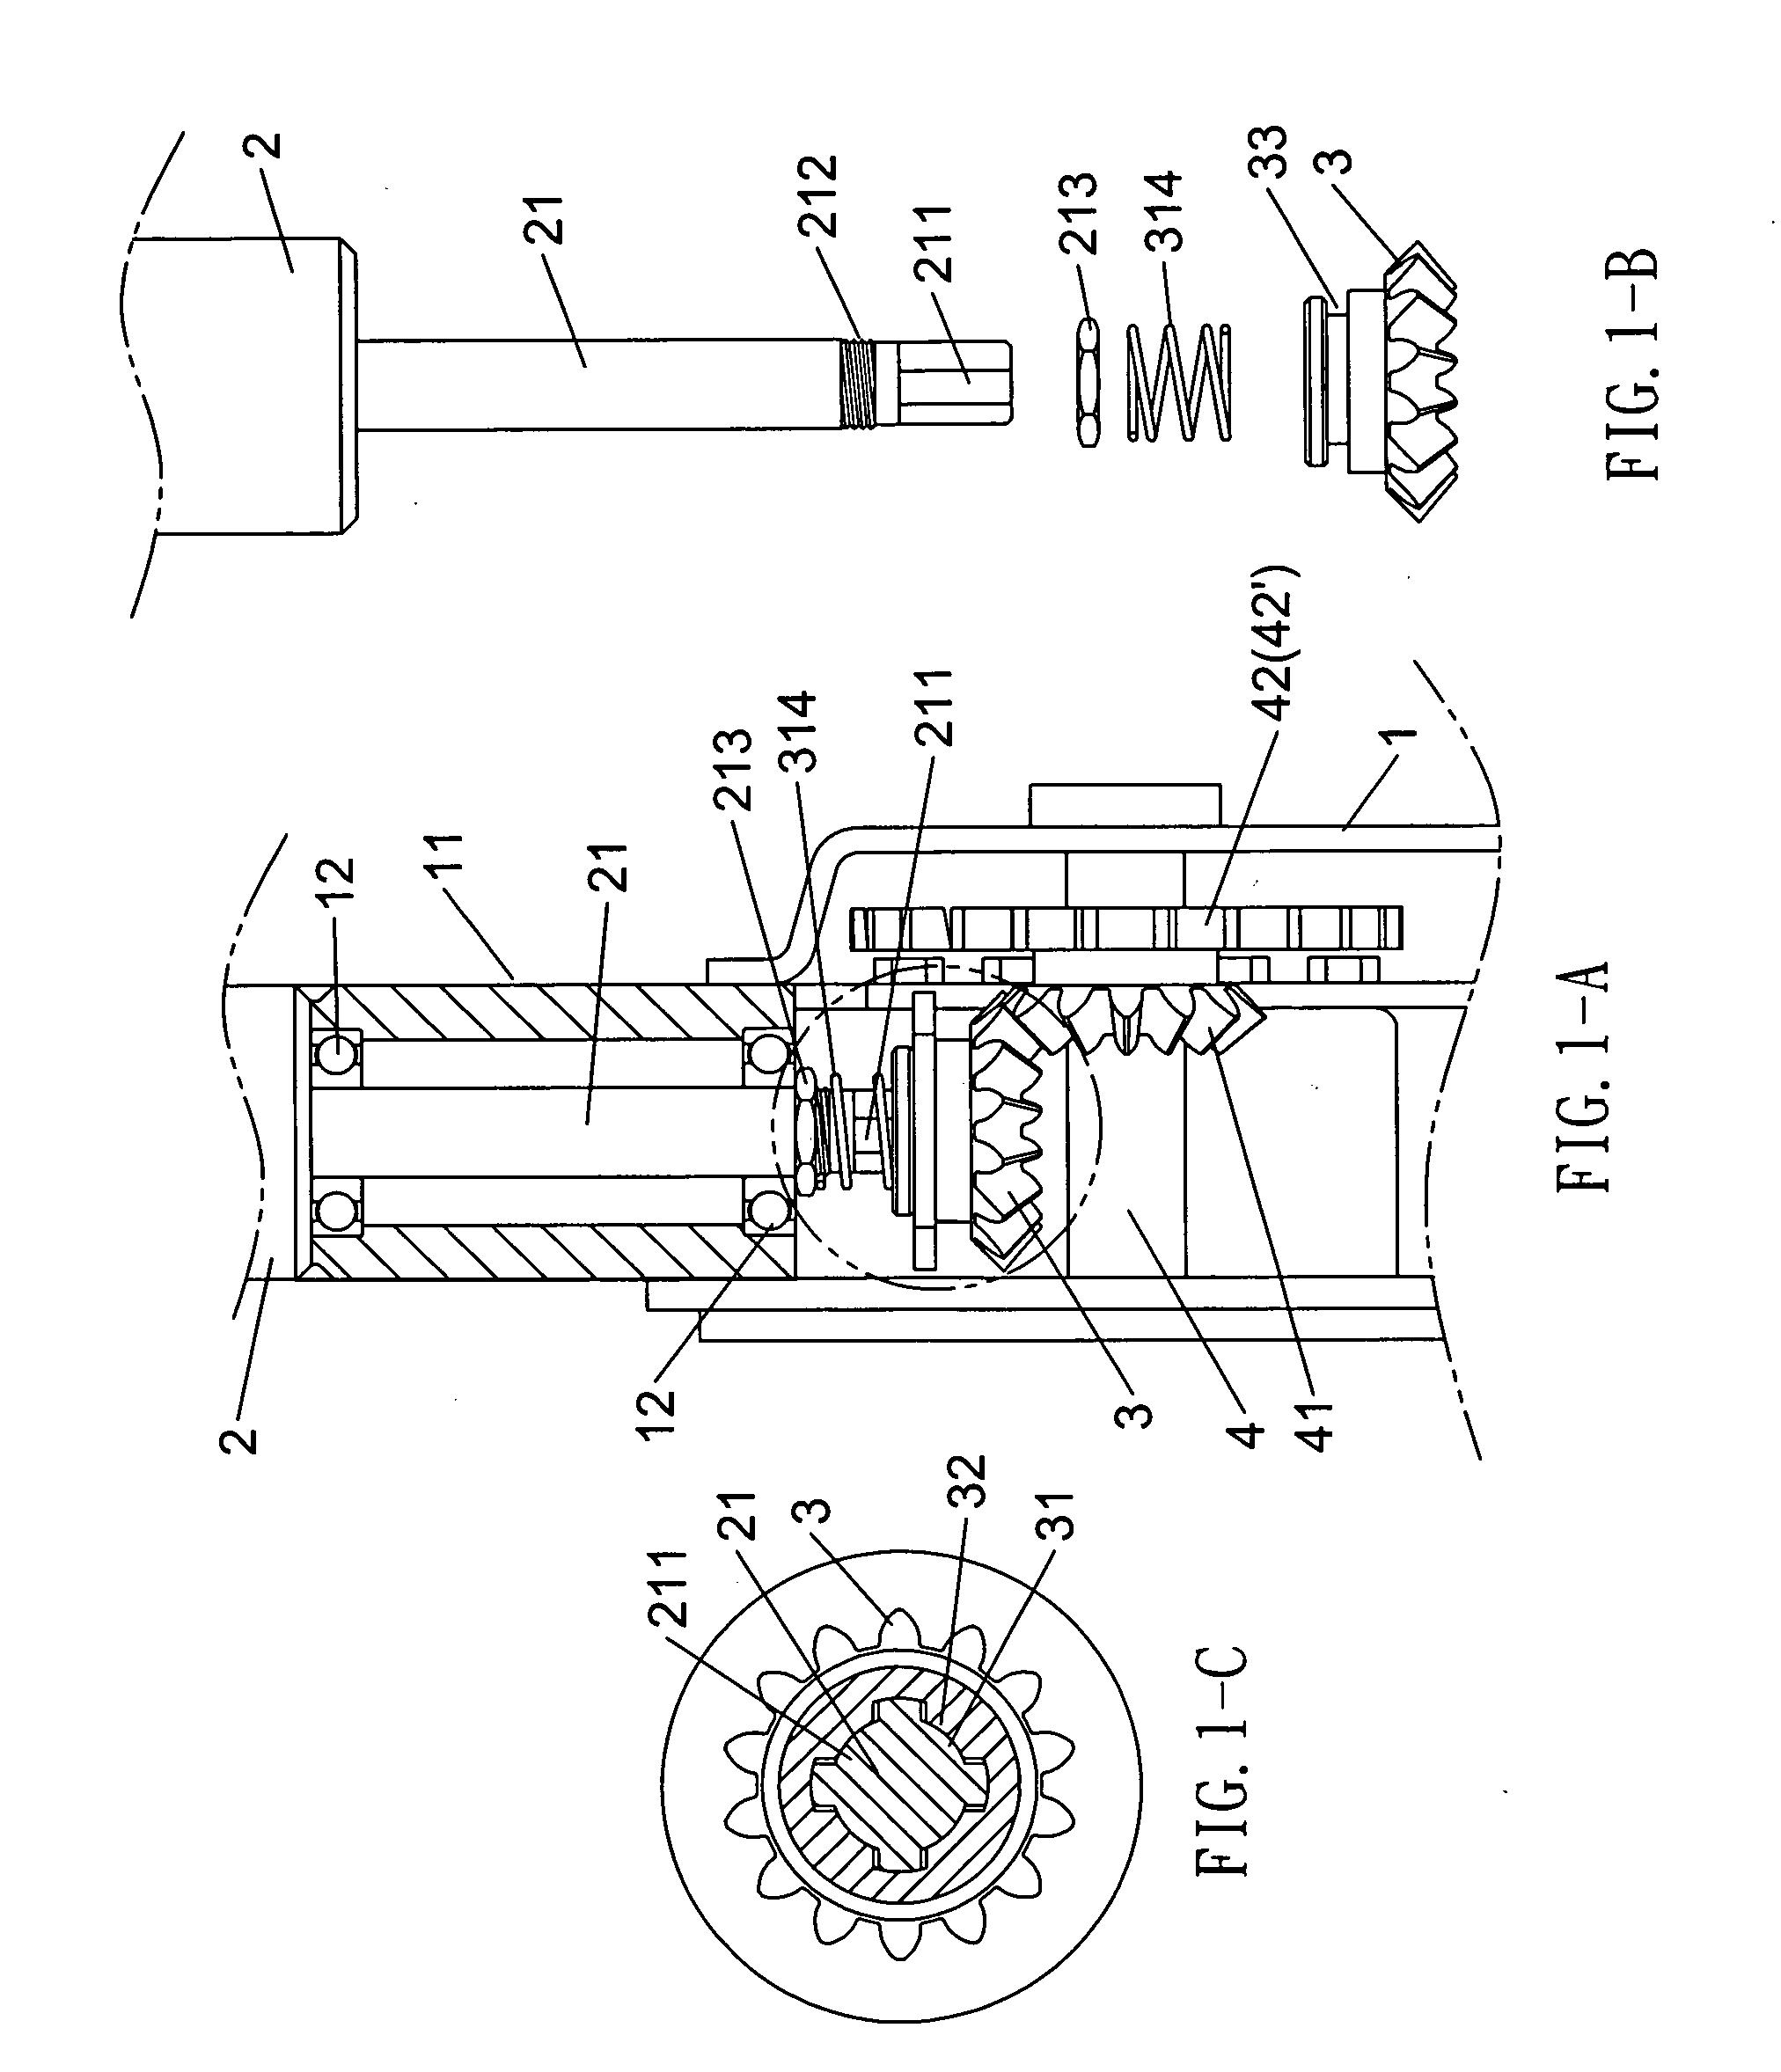 revolving chair mechanism hanging kuala lumpur patent us20070281834 rotating control